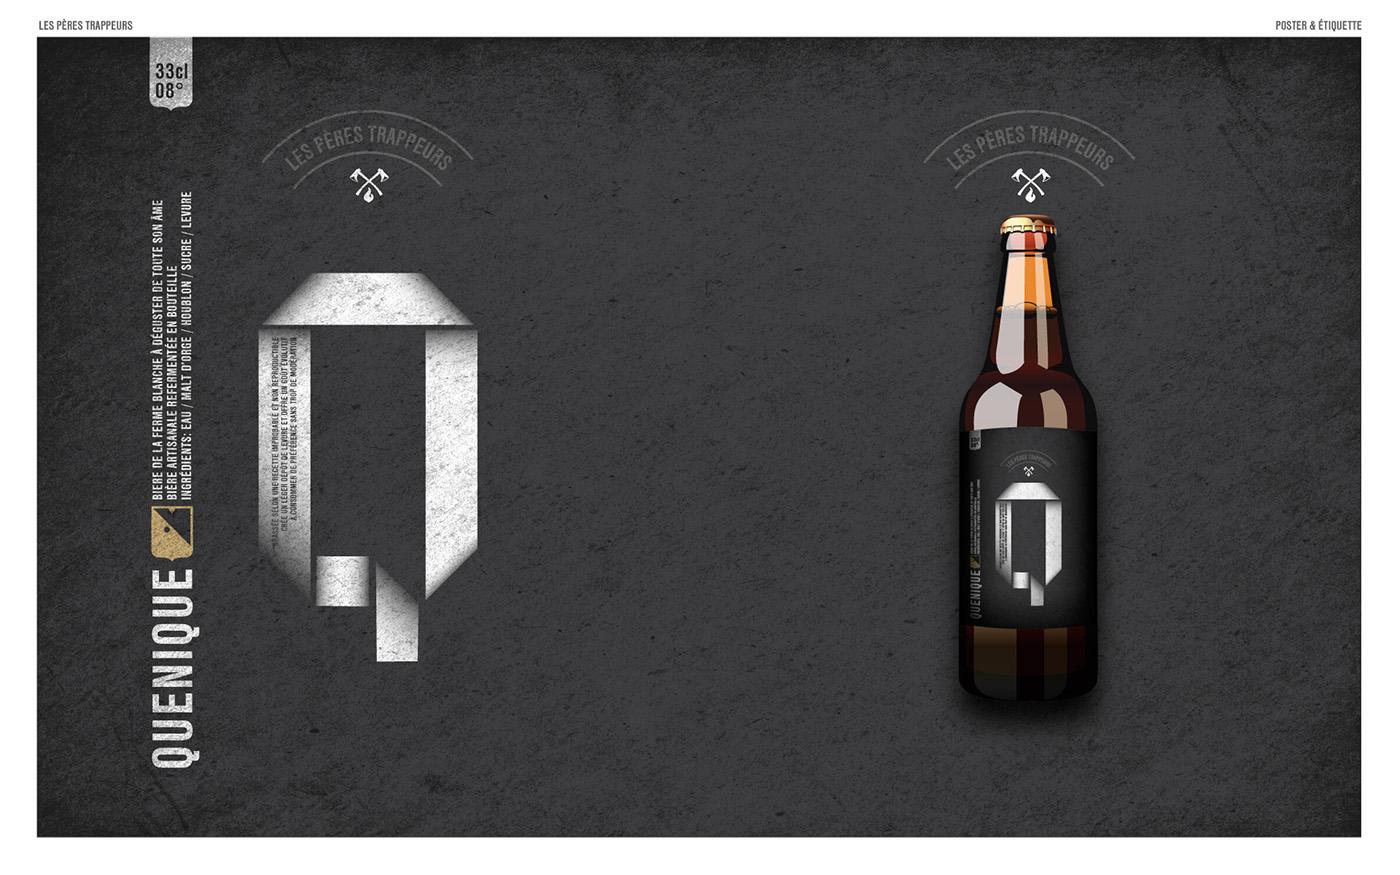 brand identity design graphique direction artistique identité visuelle logos Logotype